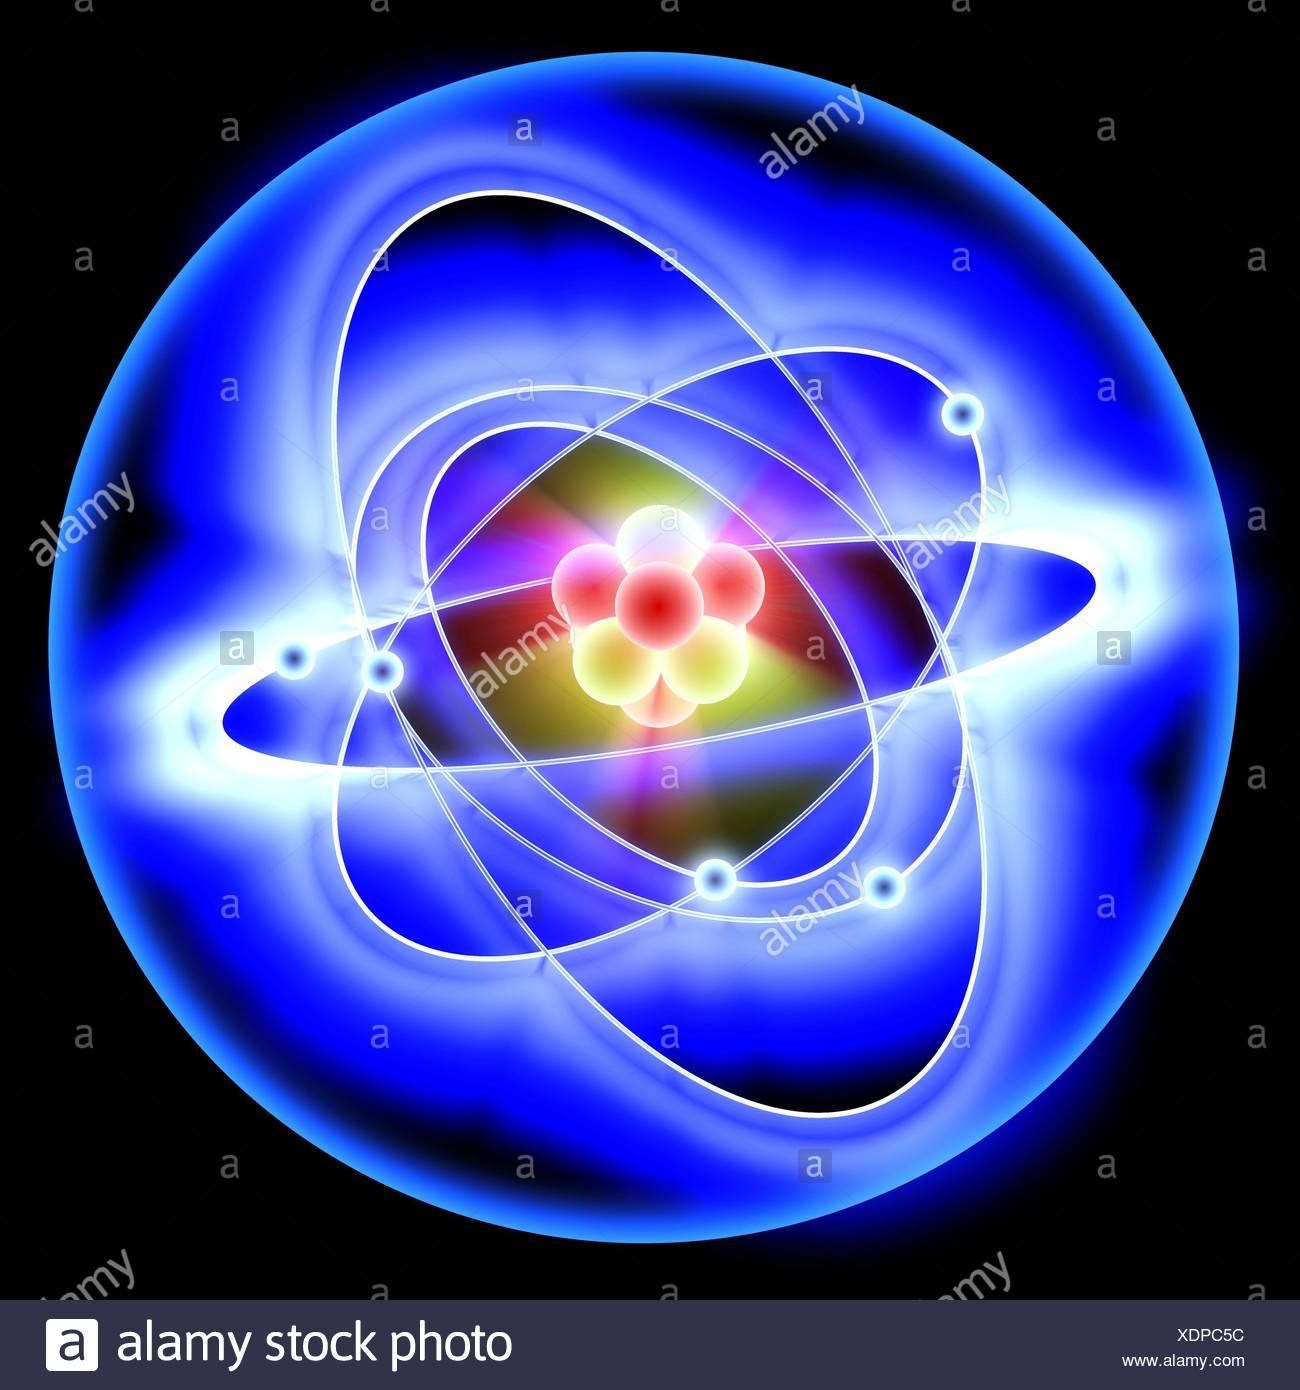 orbital diagram for beryllium 2 wire ultrasonic flow meter electron stock photos and